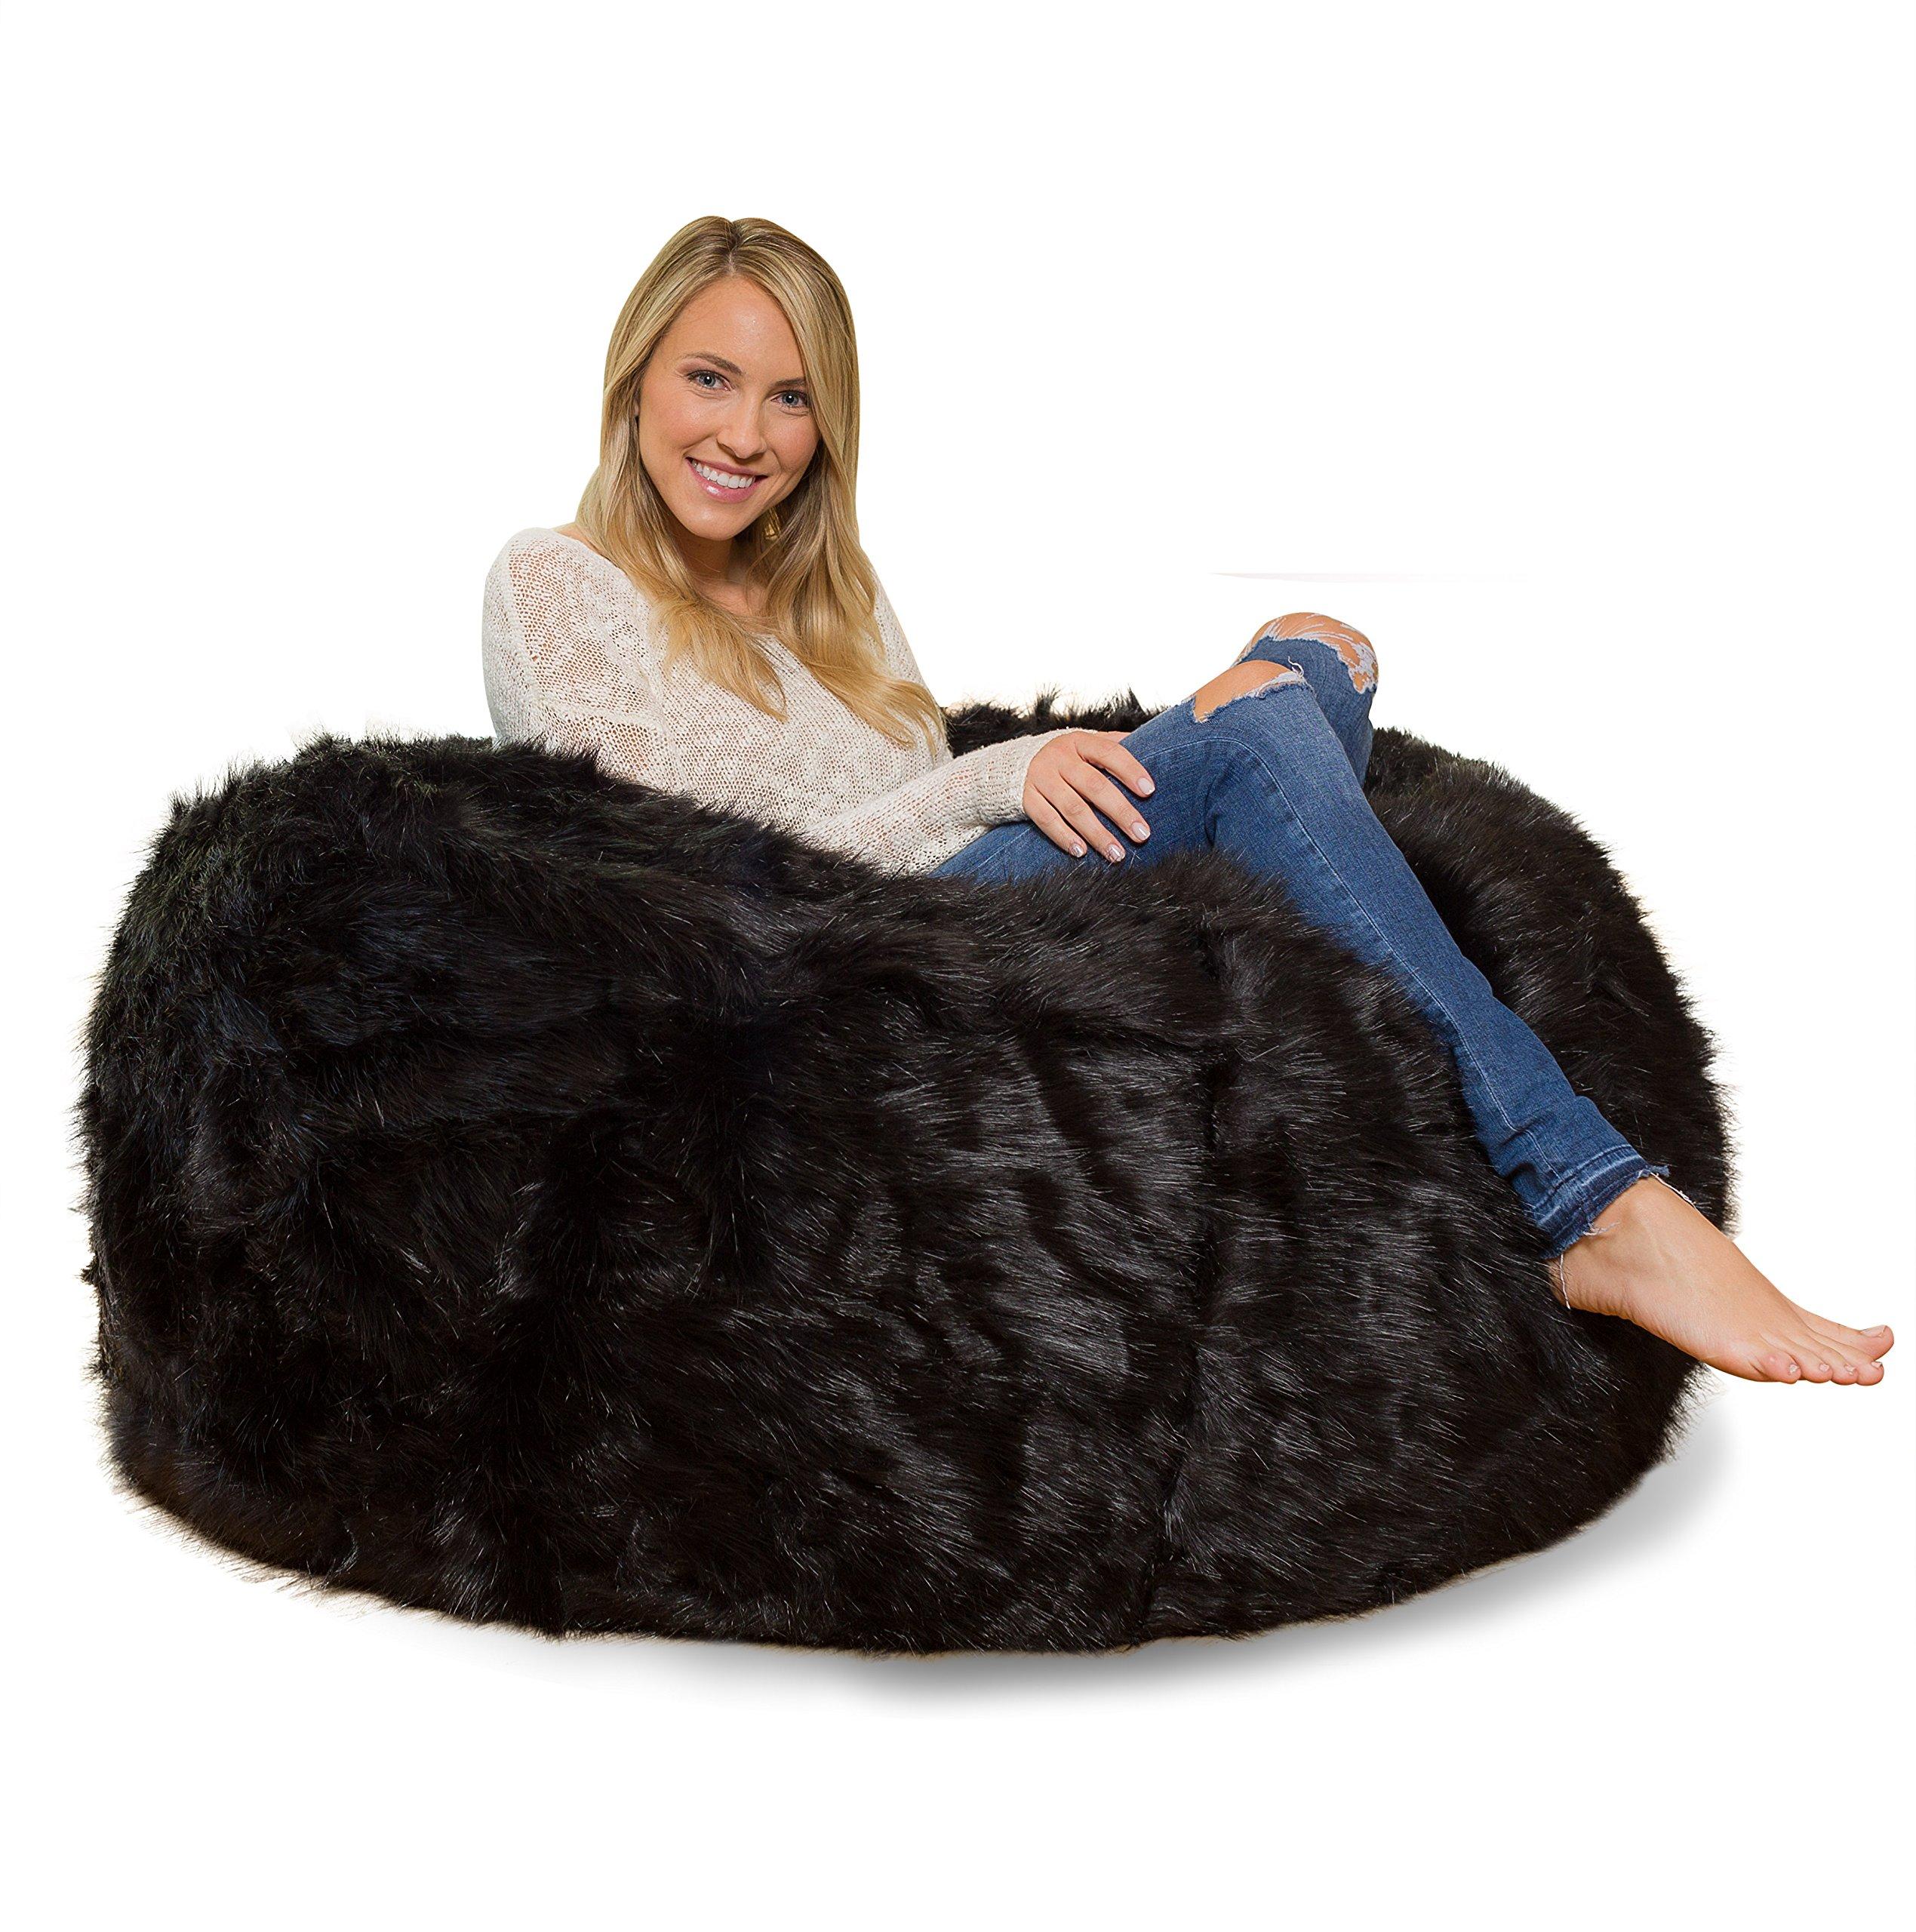 Comfy Sacks 4 ft Memory Foam Bean Bag Chair, Black Furry